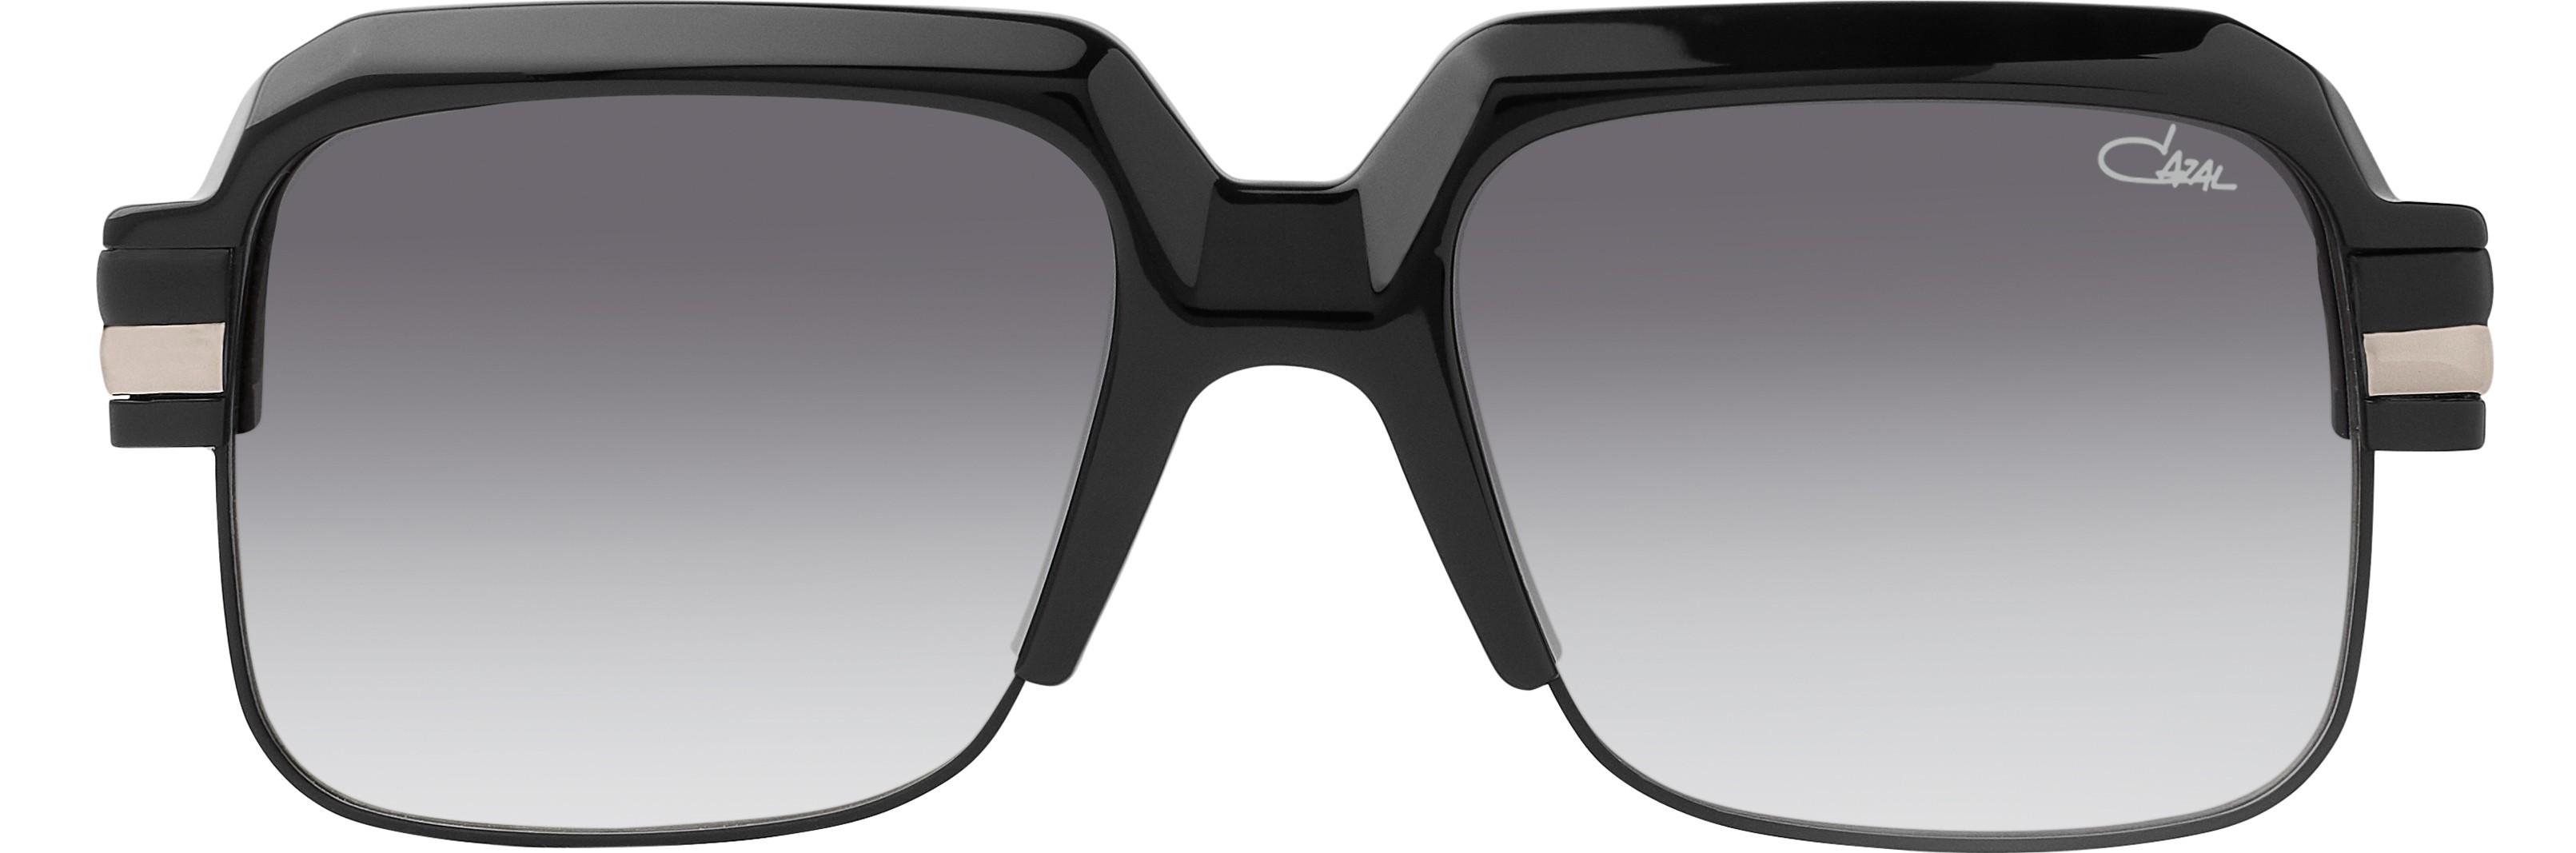 57007db556e Cazal - Vintage 670 304 - Legendary - Black Silver - Sunglasses - Cazal  Eyewear - Avvenice